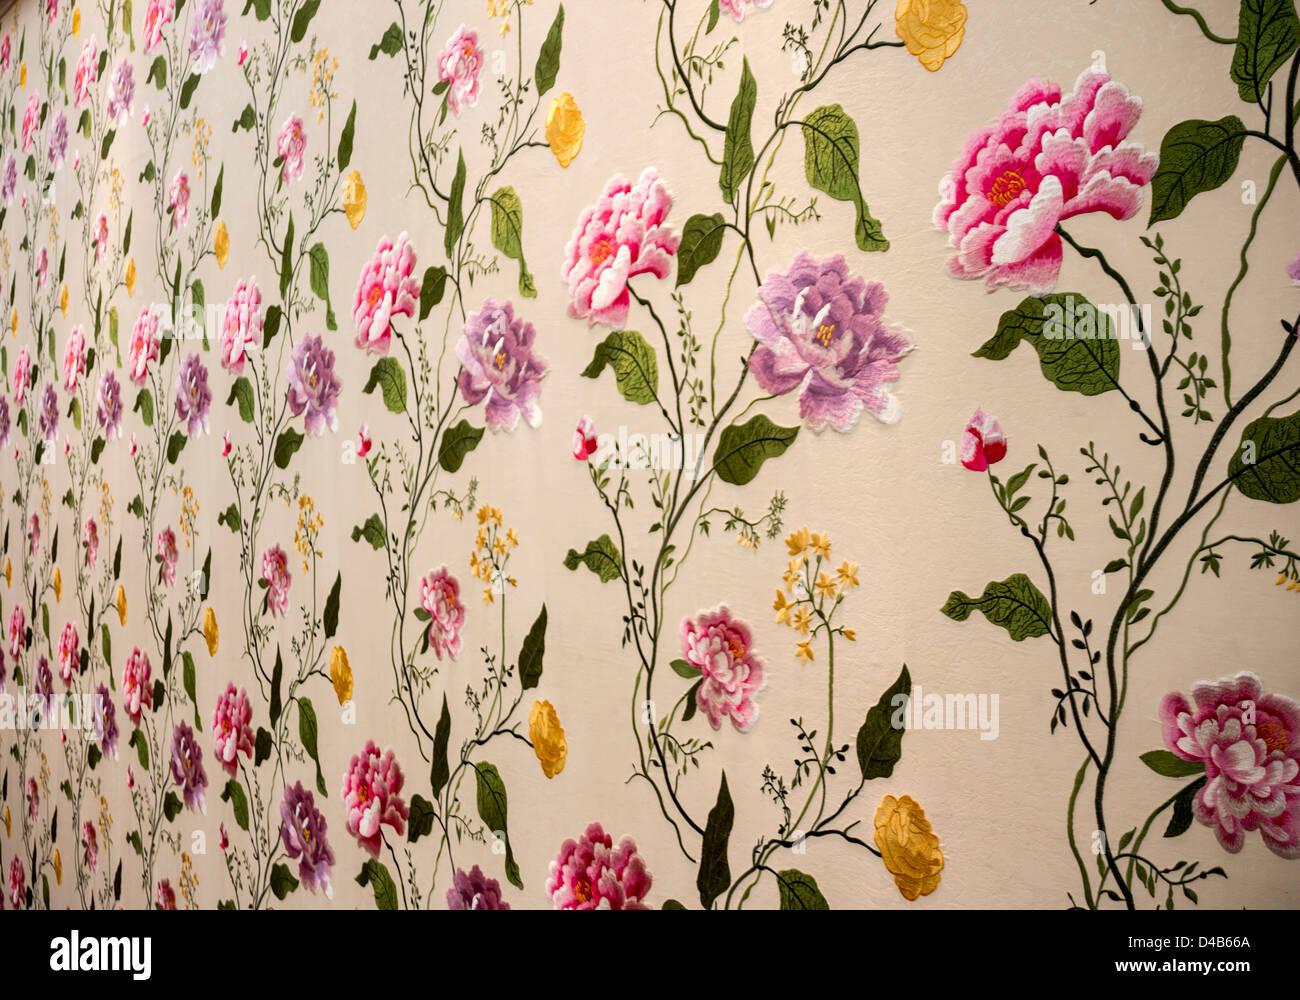 Retro Floral Wallpaper Background Stock Photo 54336082 Alamy